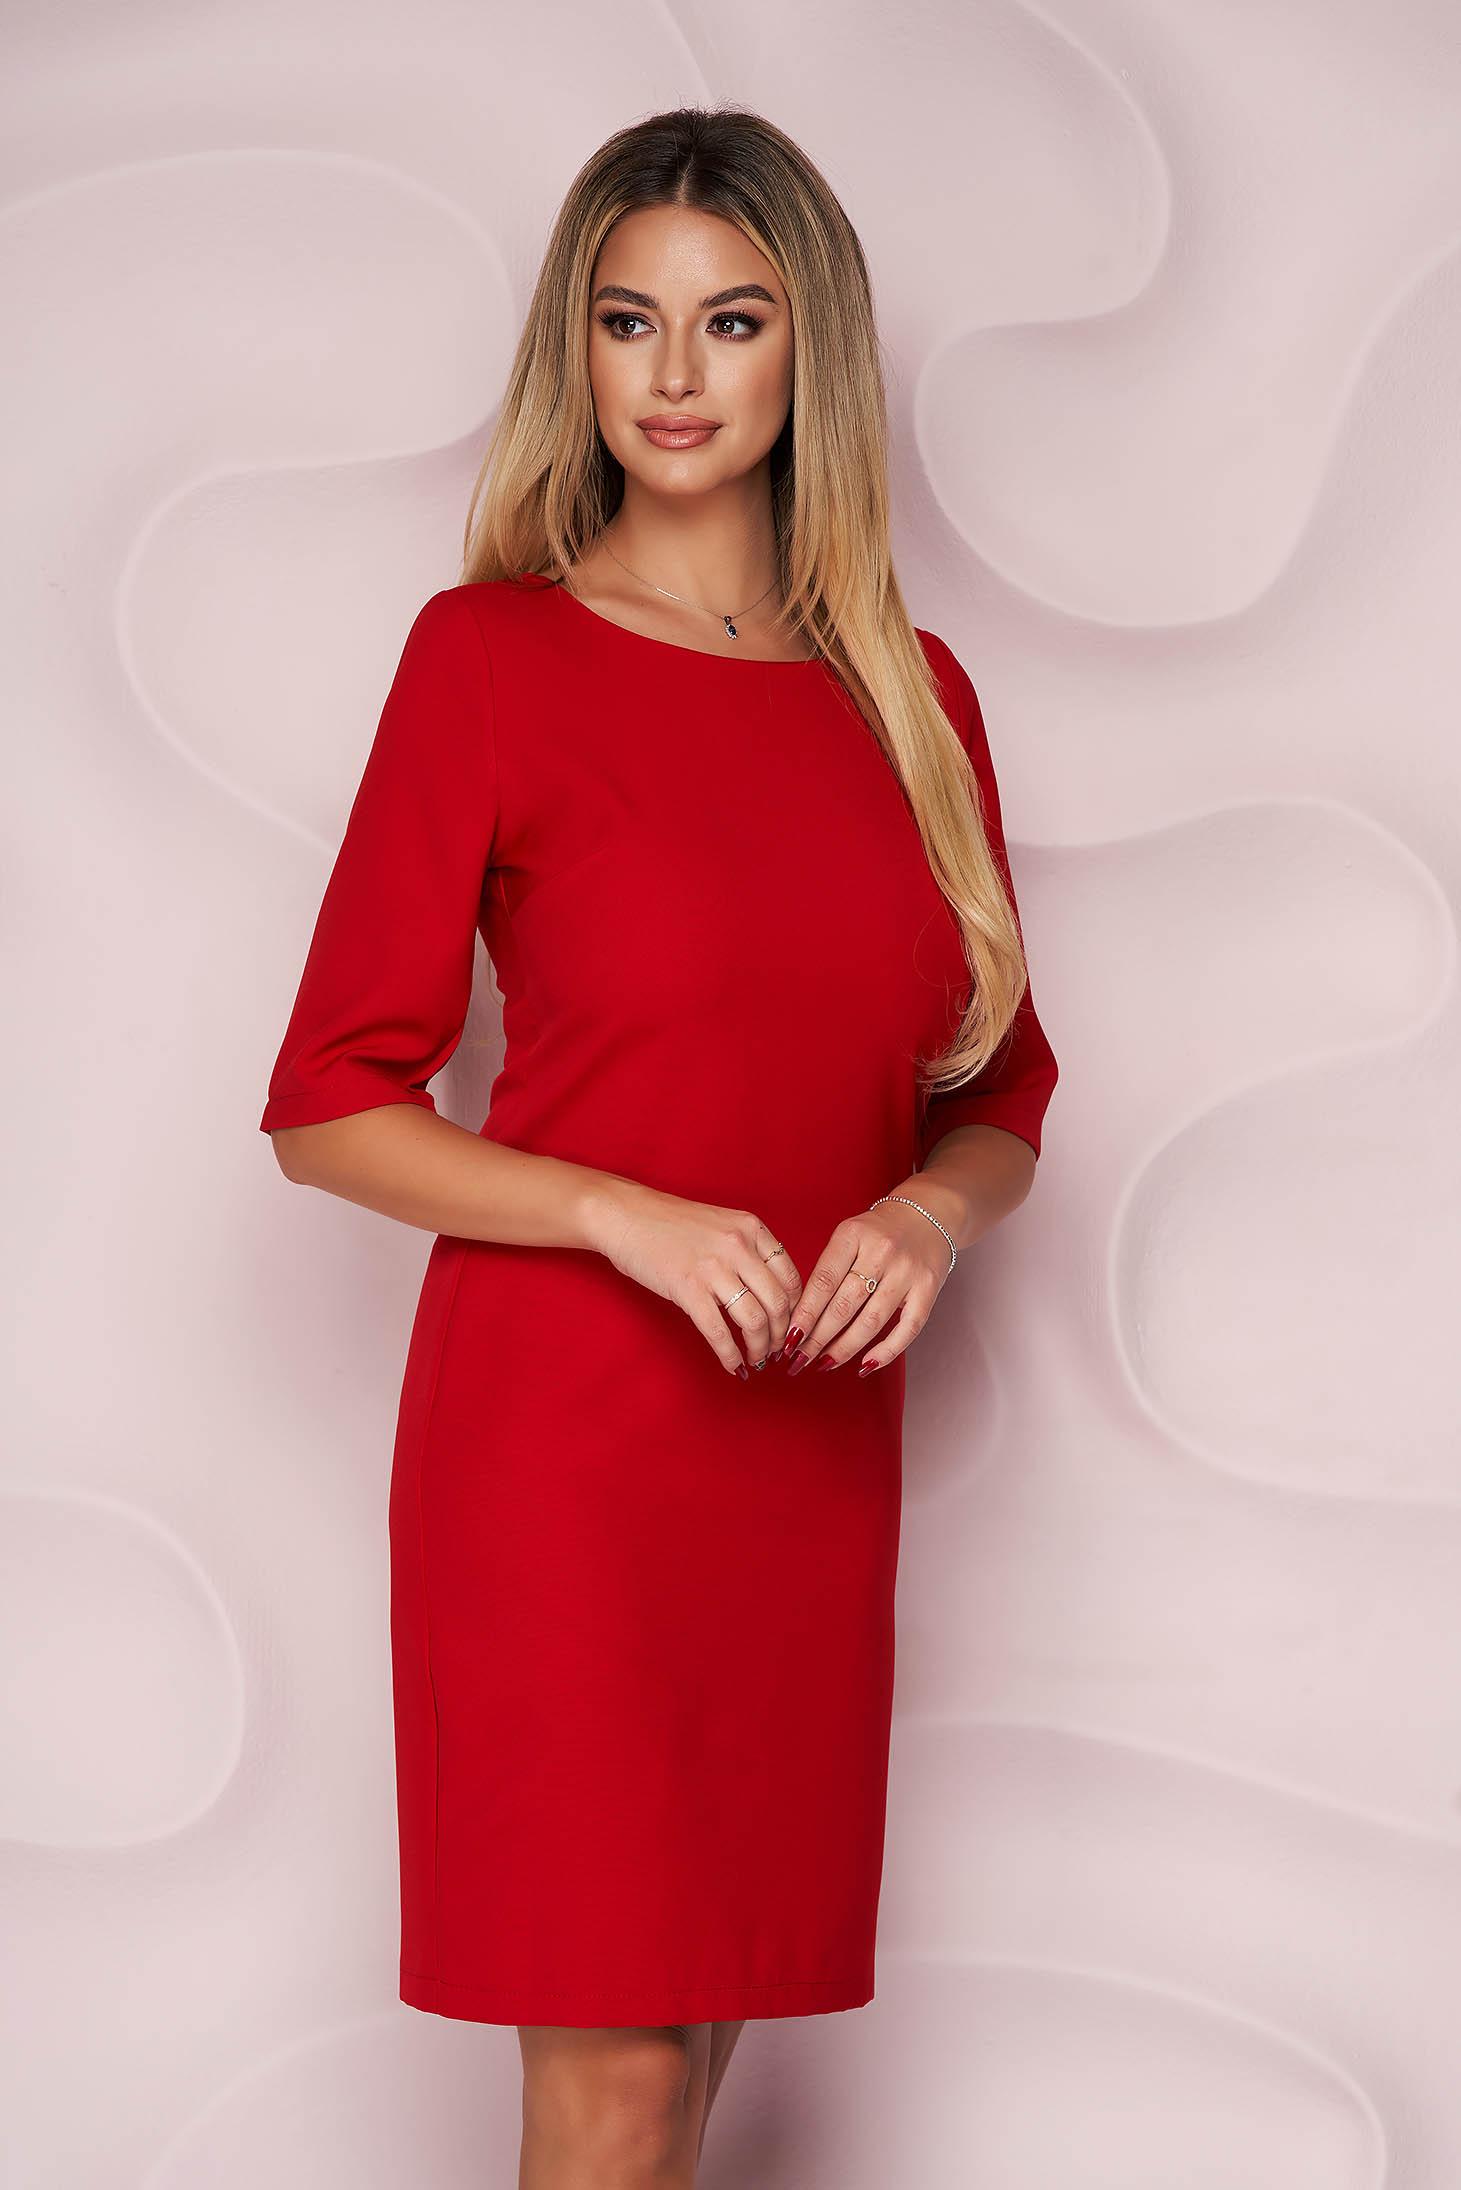 StarShinerS red dress office straight short cut slightly elastic fabric soft fabric